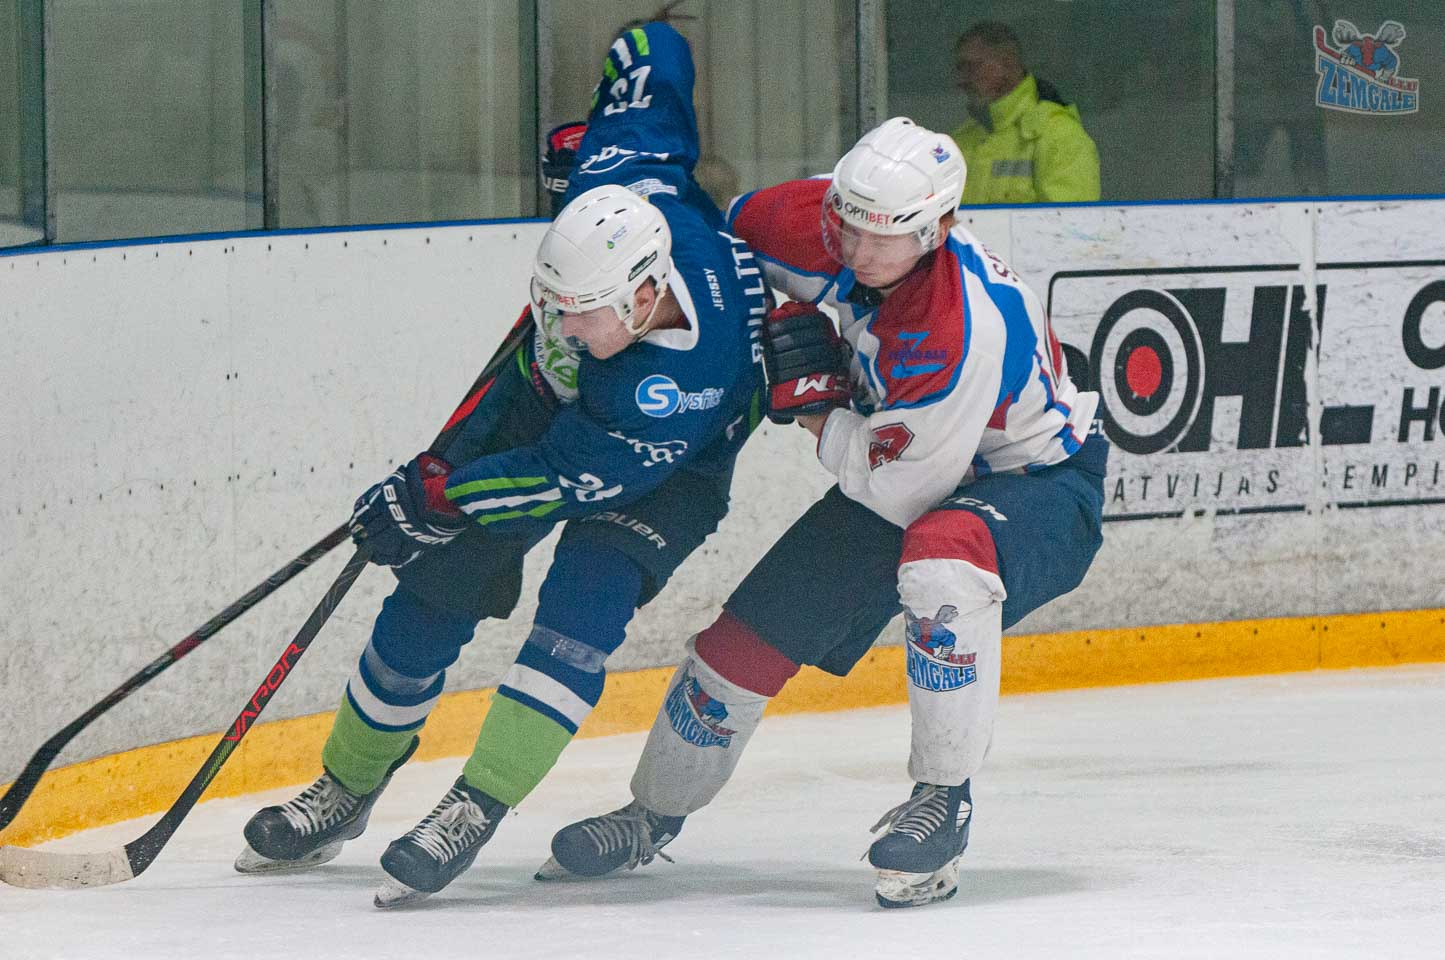 Hokejists mēģina atņemt ripu pretiniekam